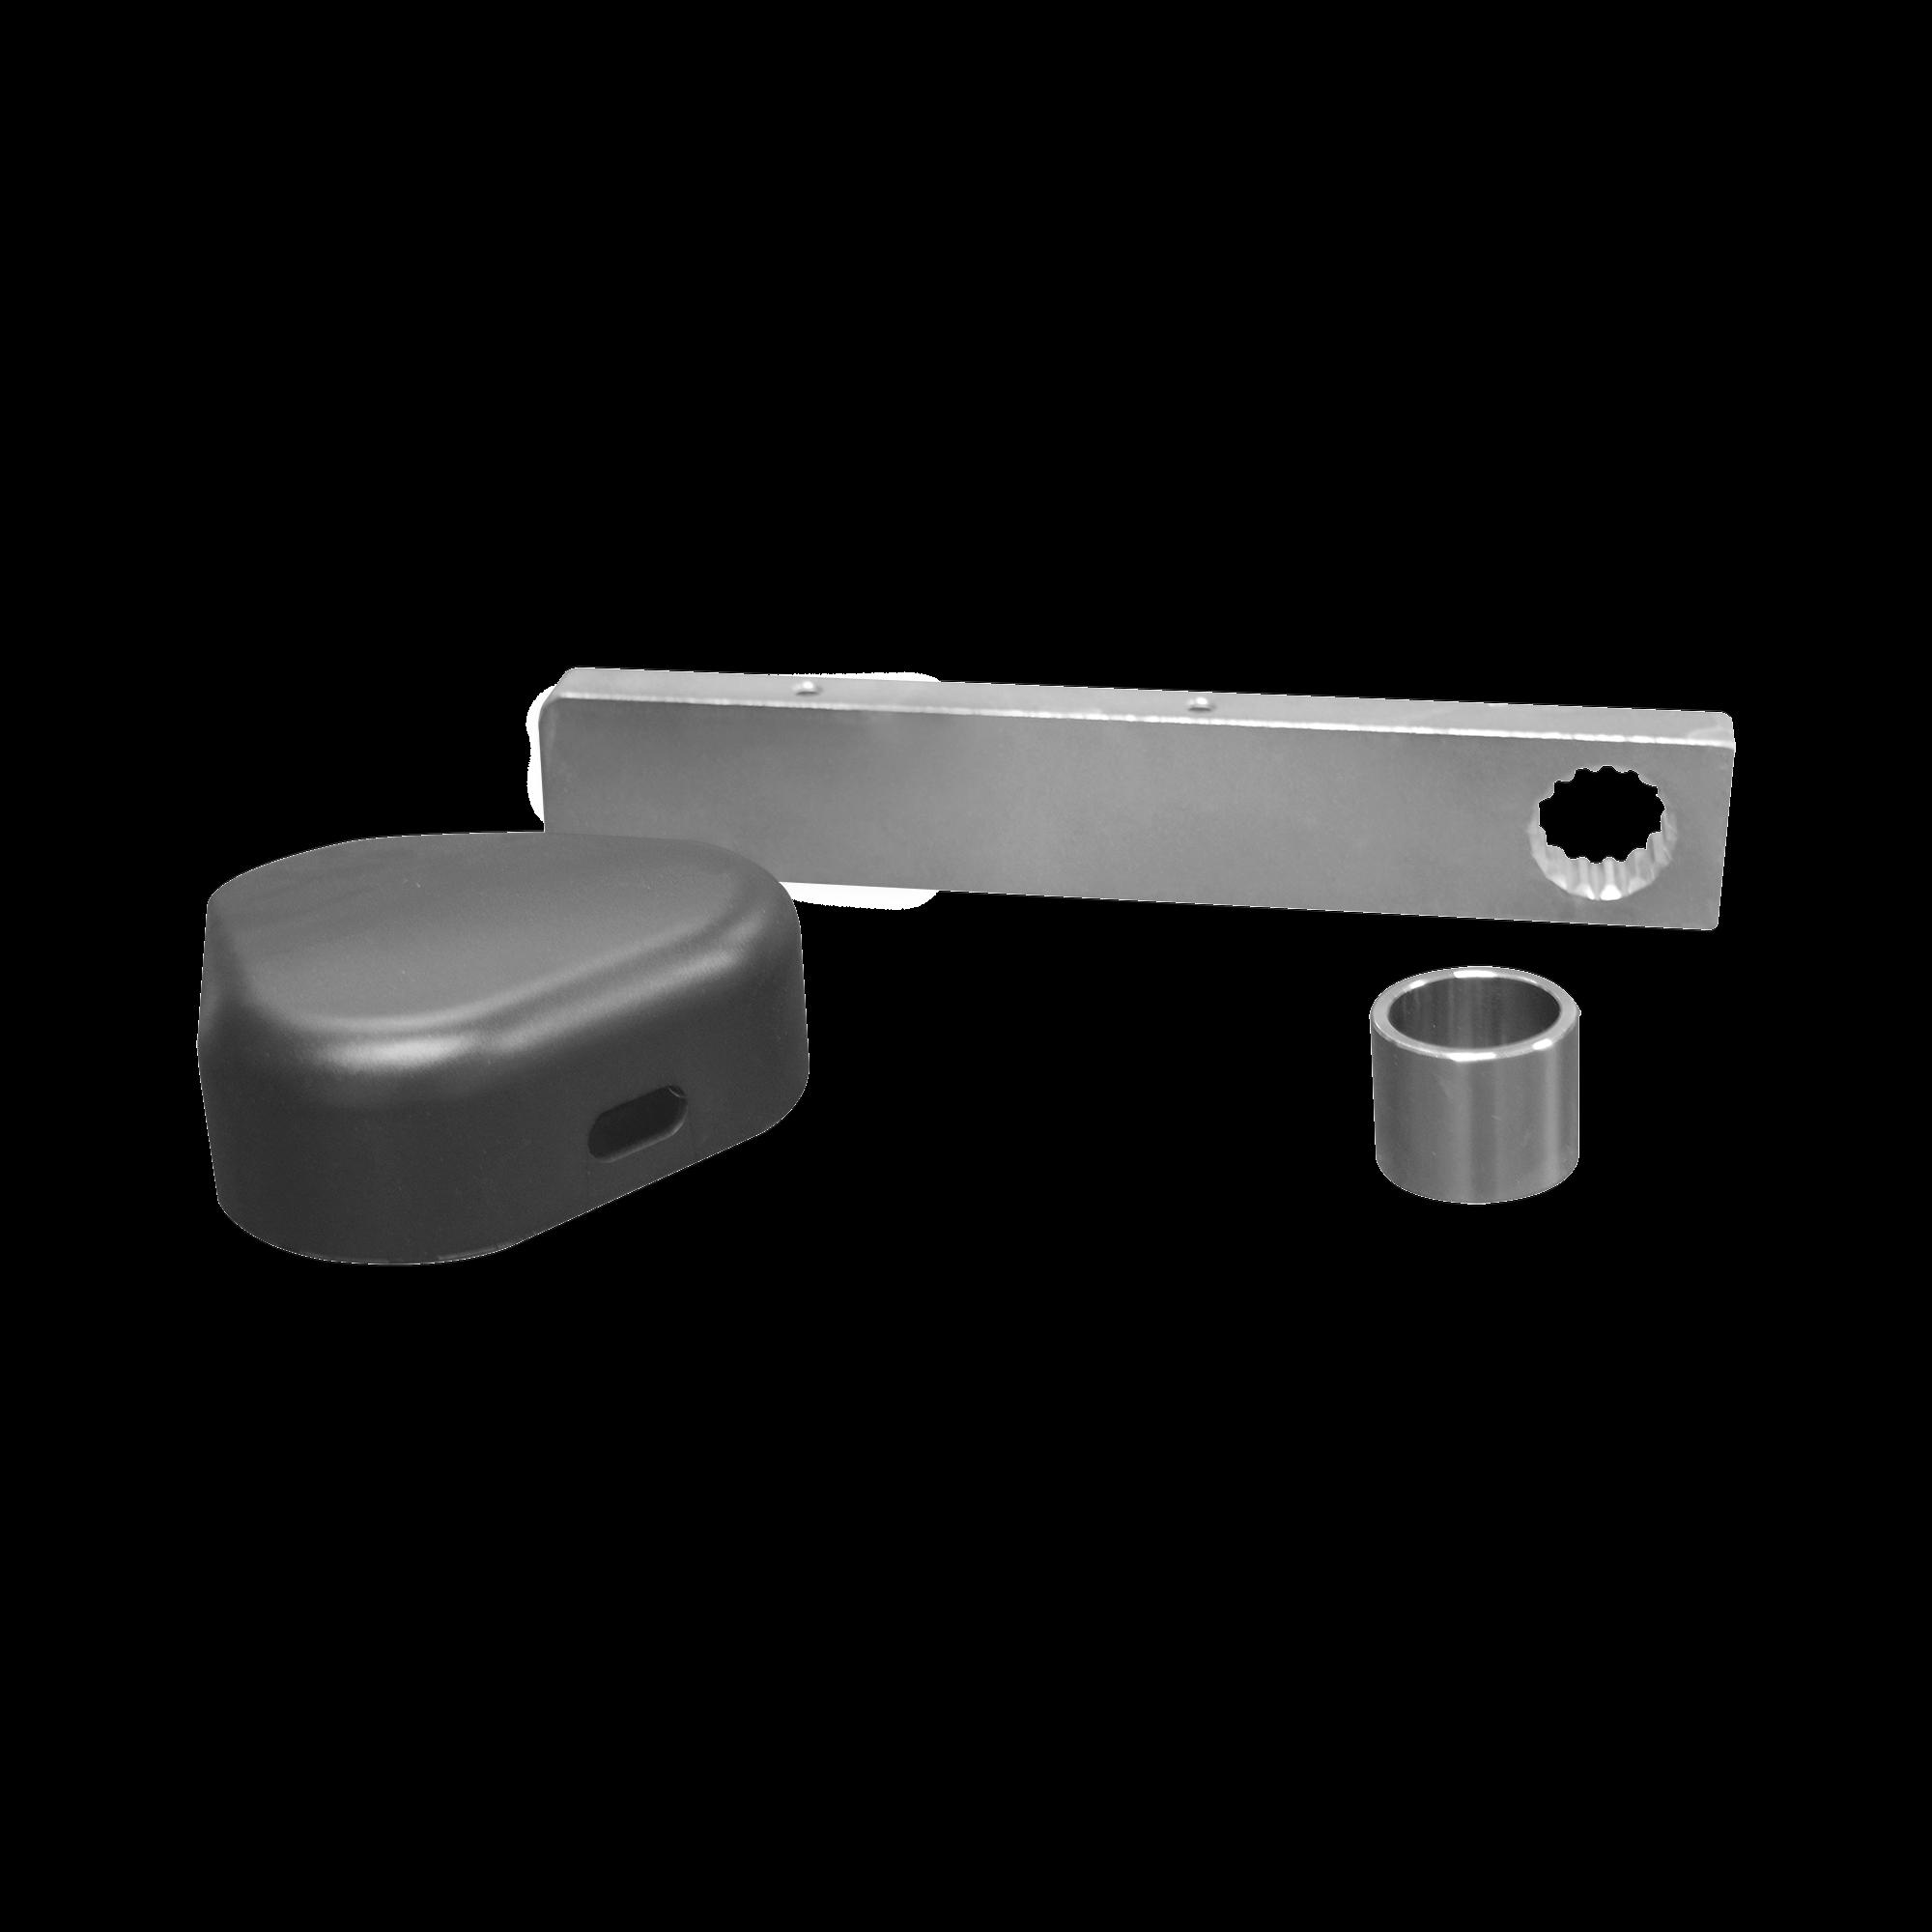 Tasca para brazo cuadrado de barrera FAAC620